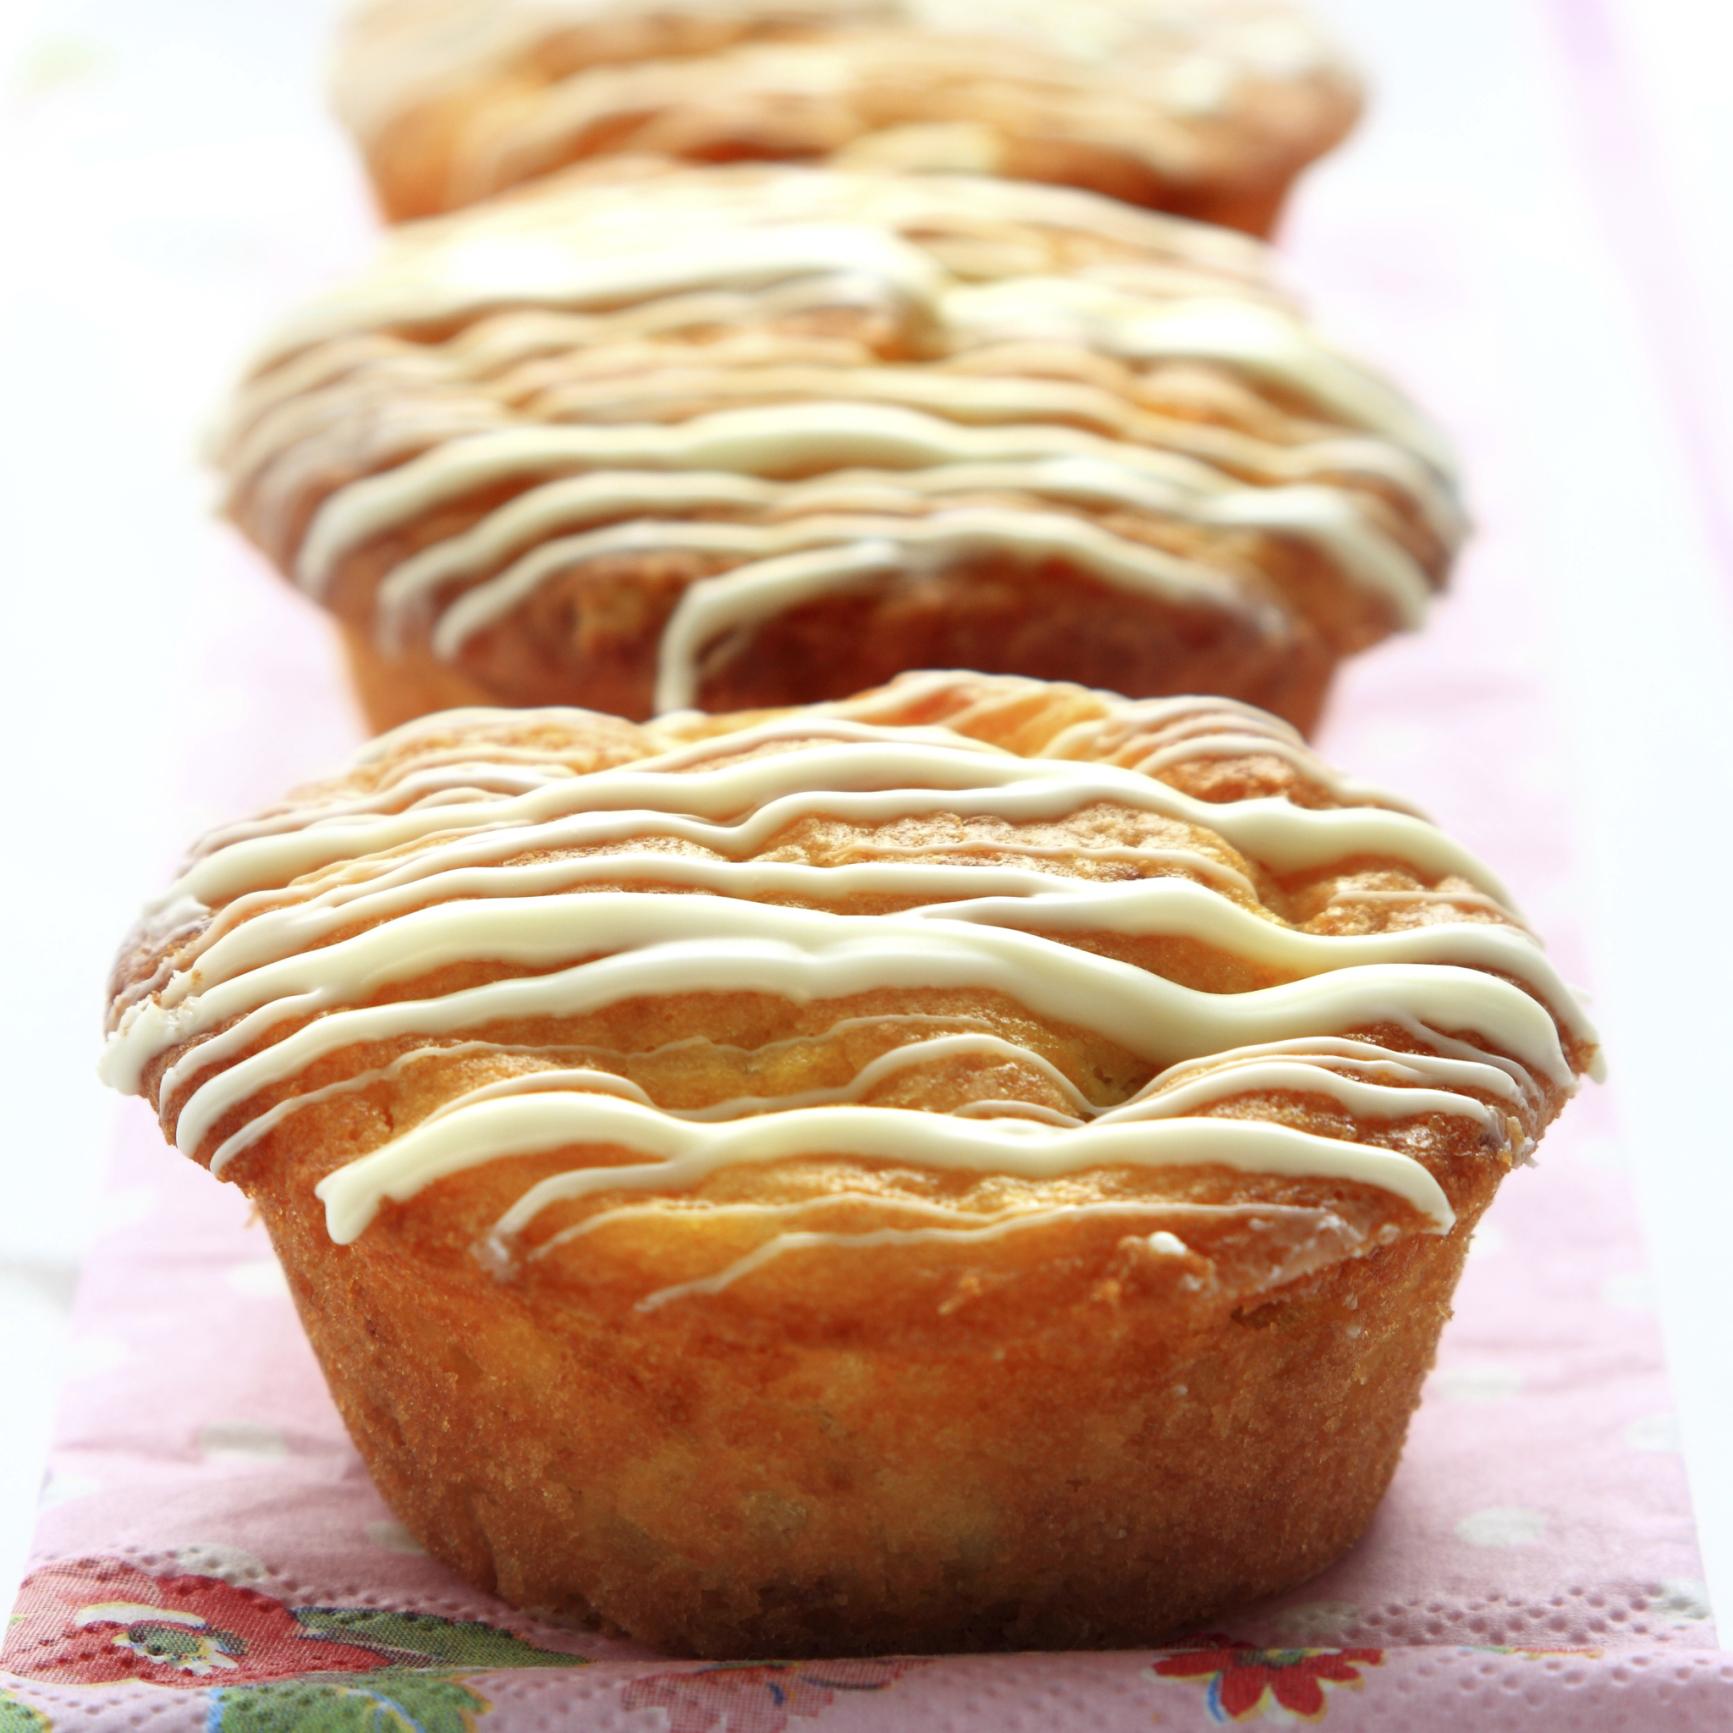 Muffin relleno de crema de chocolate blanco